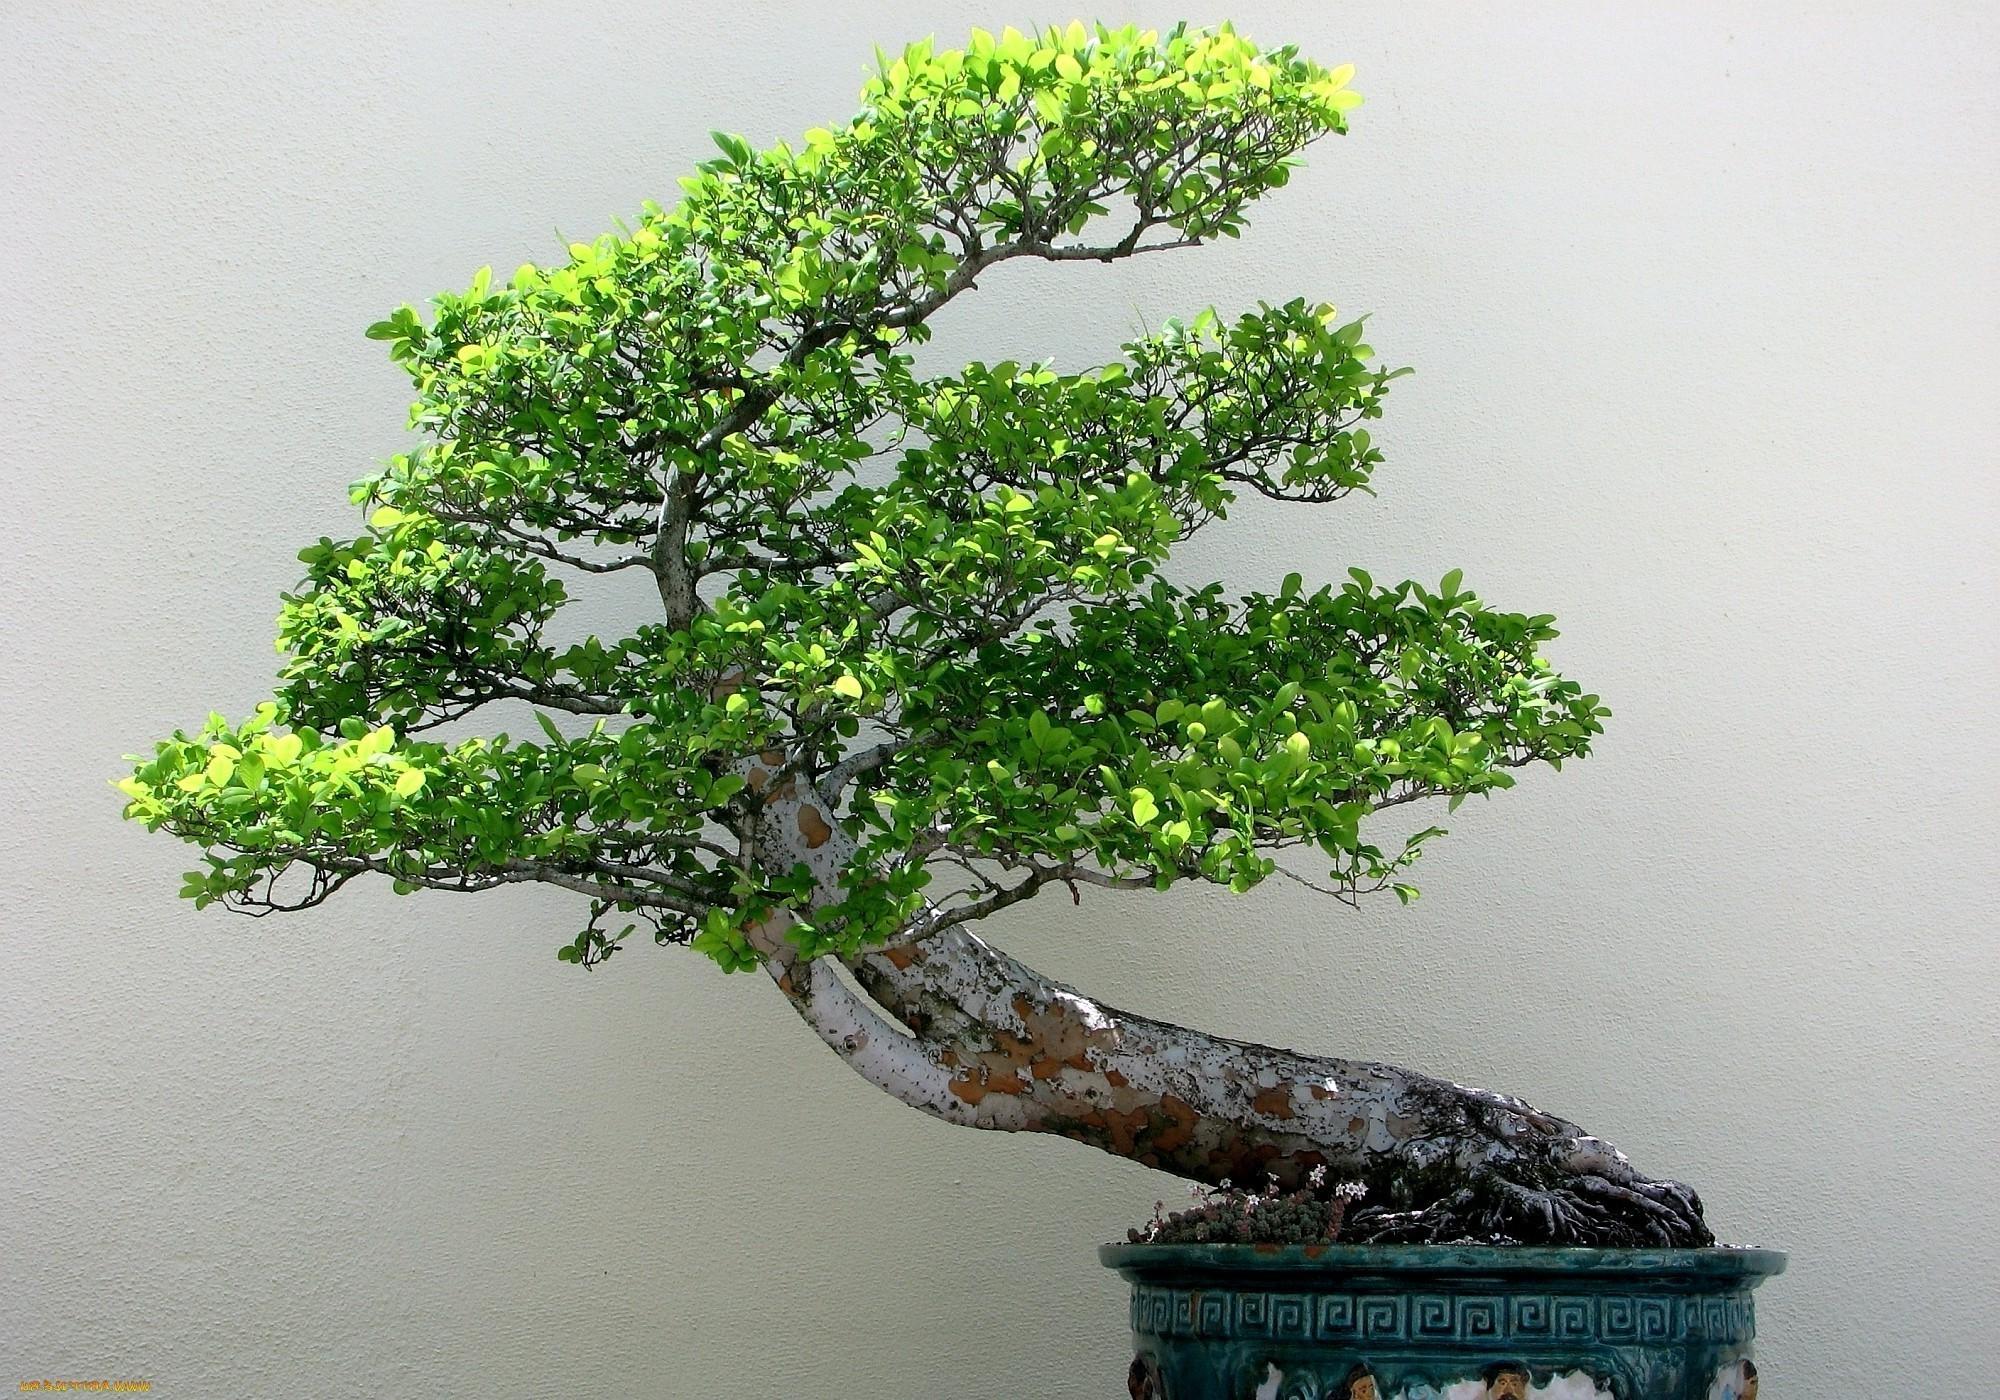 Res: 2000x1400, bonsai, Plants, Trees, Nature